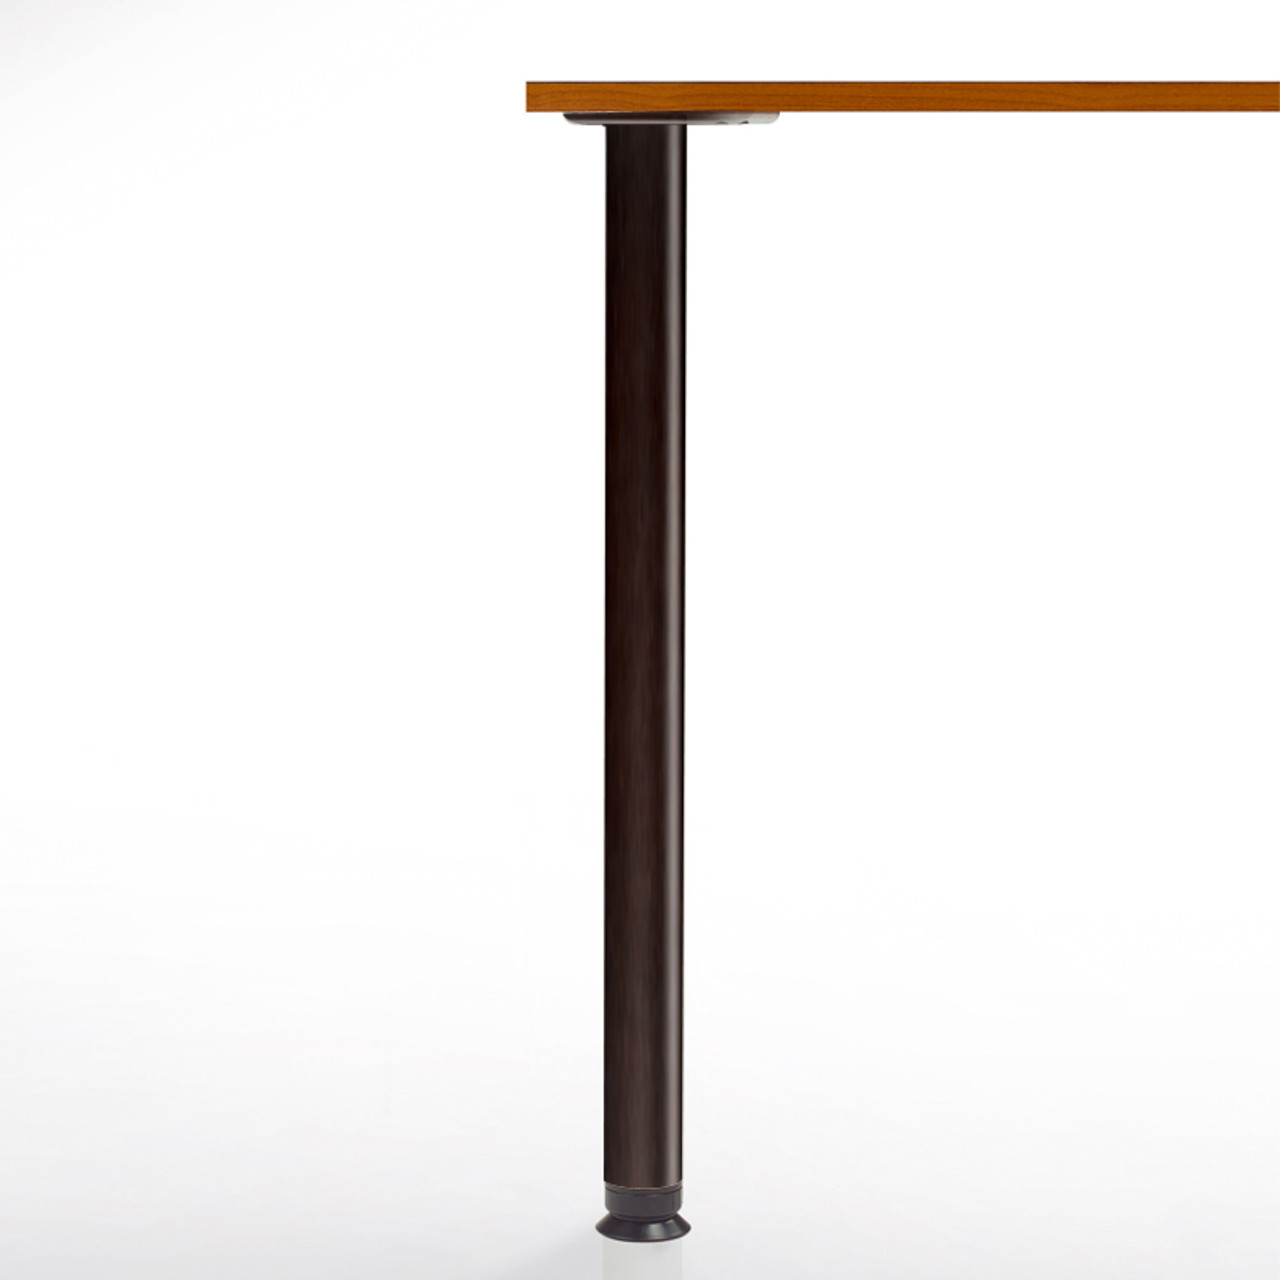 Zoom Table Legs, 27-3/4'' height, 2-3/8'' diameter leg 4'' adjustable foot, black matte - replacementtablelegs.com